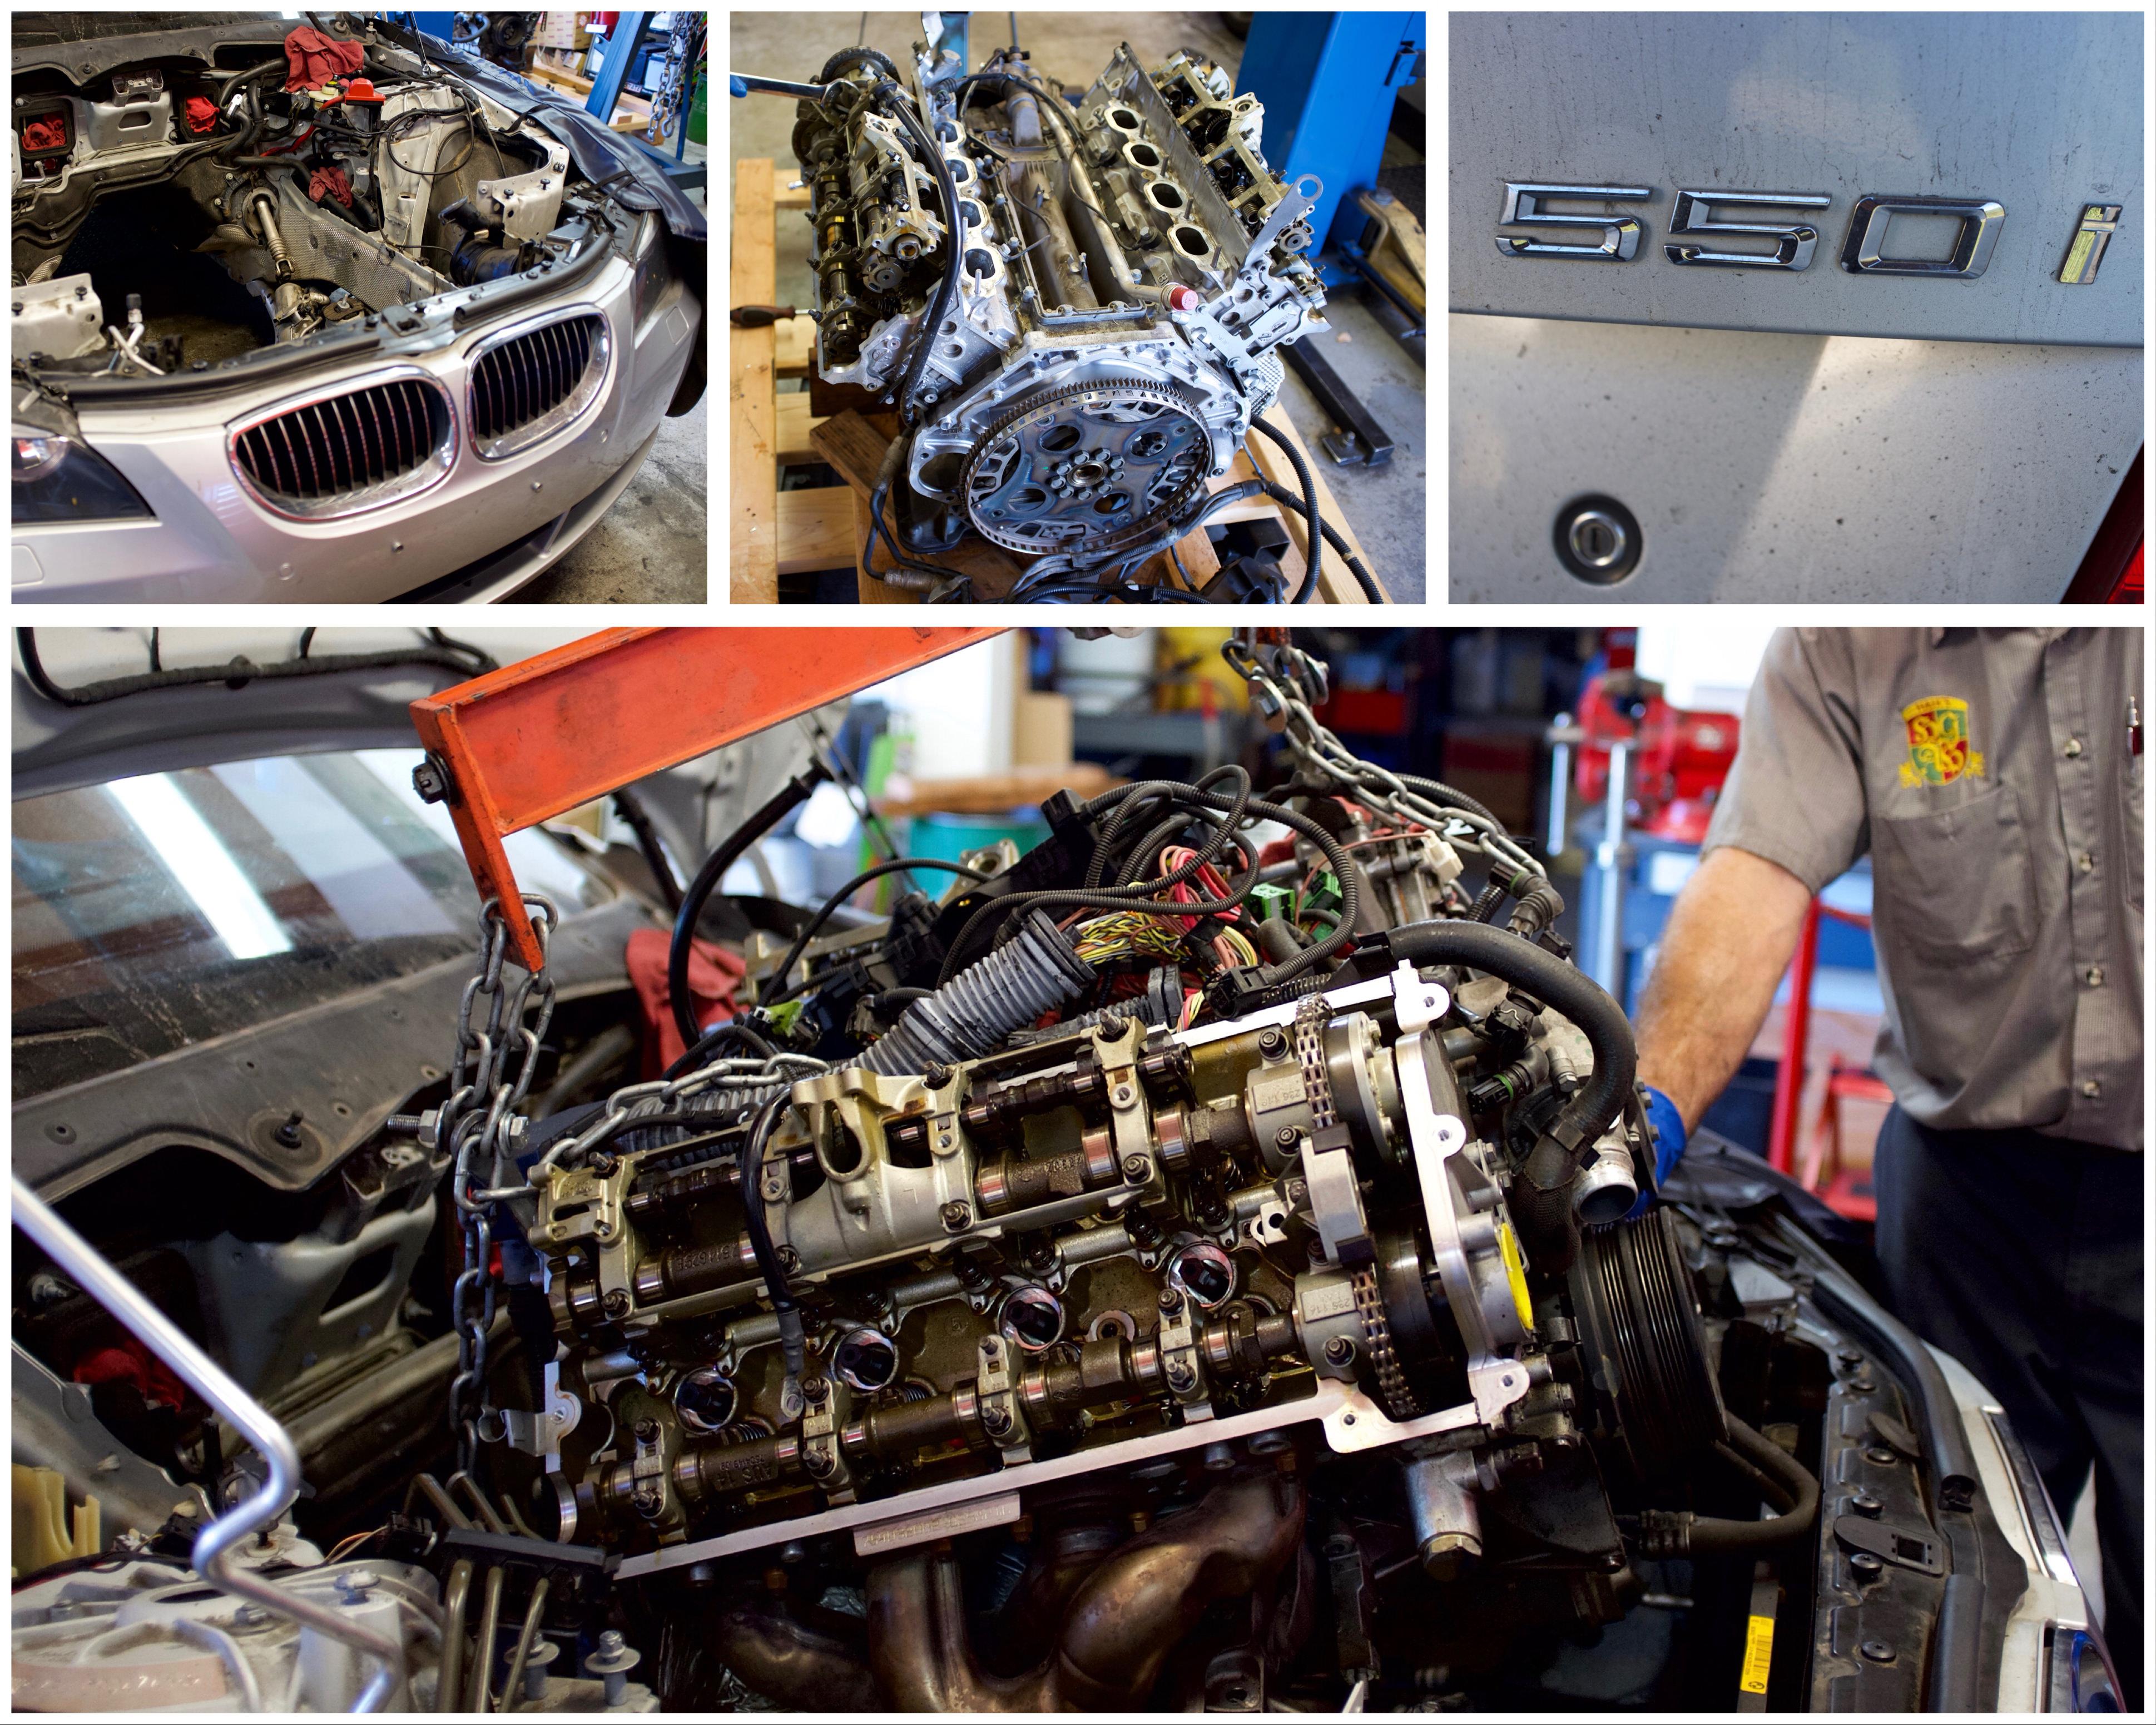 Bmw Repair Service Santa Barbara Haiks German Autohaus Auto Mechanic Engine Brakes Removal Of At